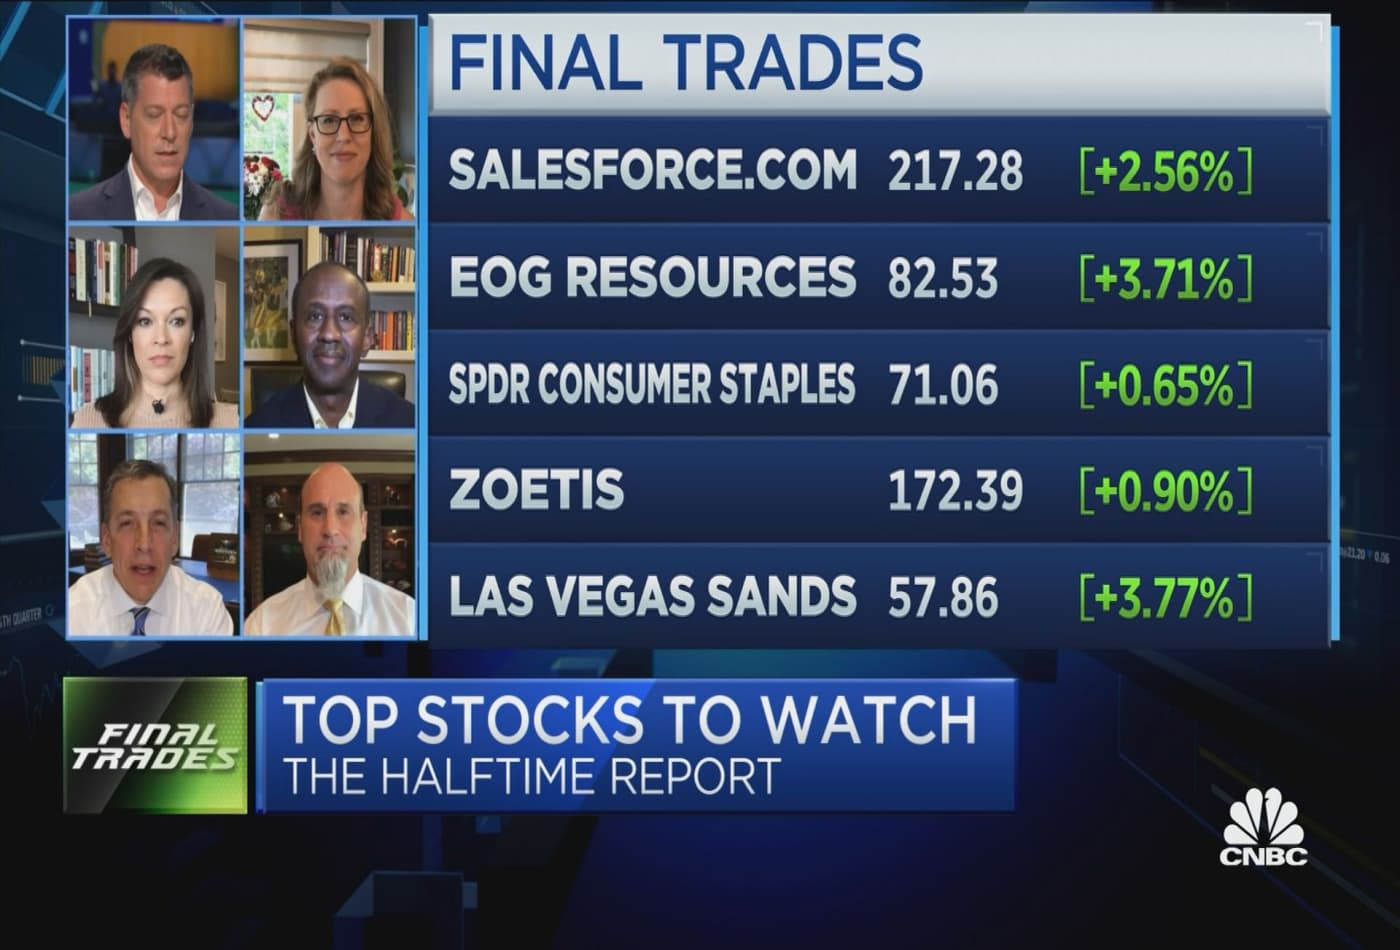 Final Trades: Salesforce, EOG Resources, Las Vegas Sands & more